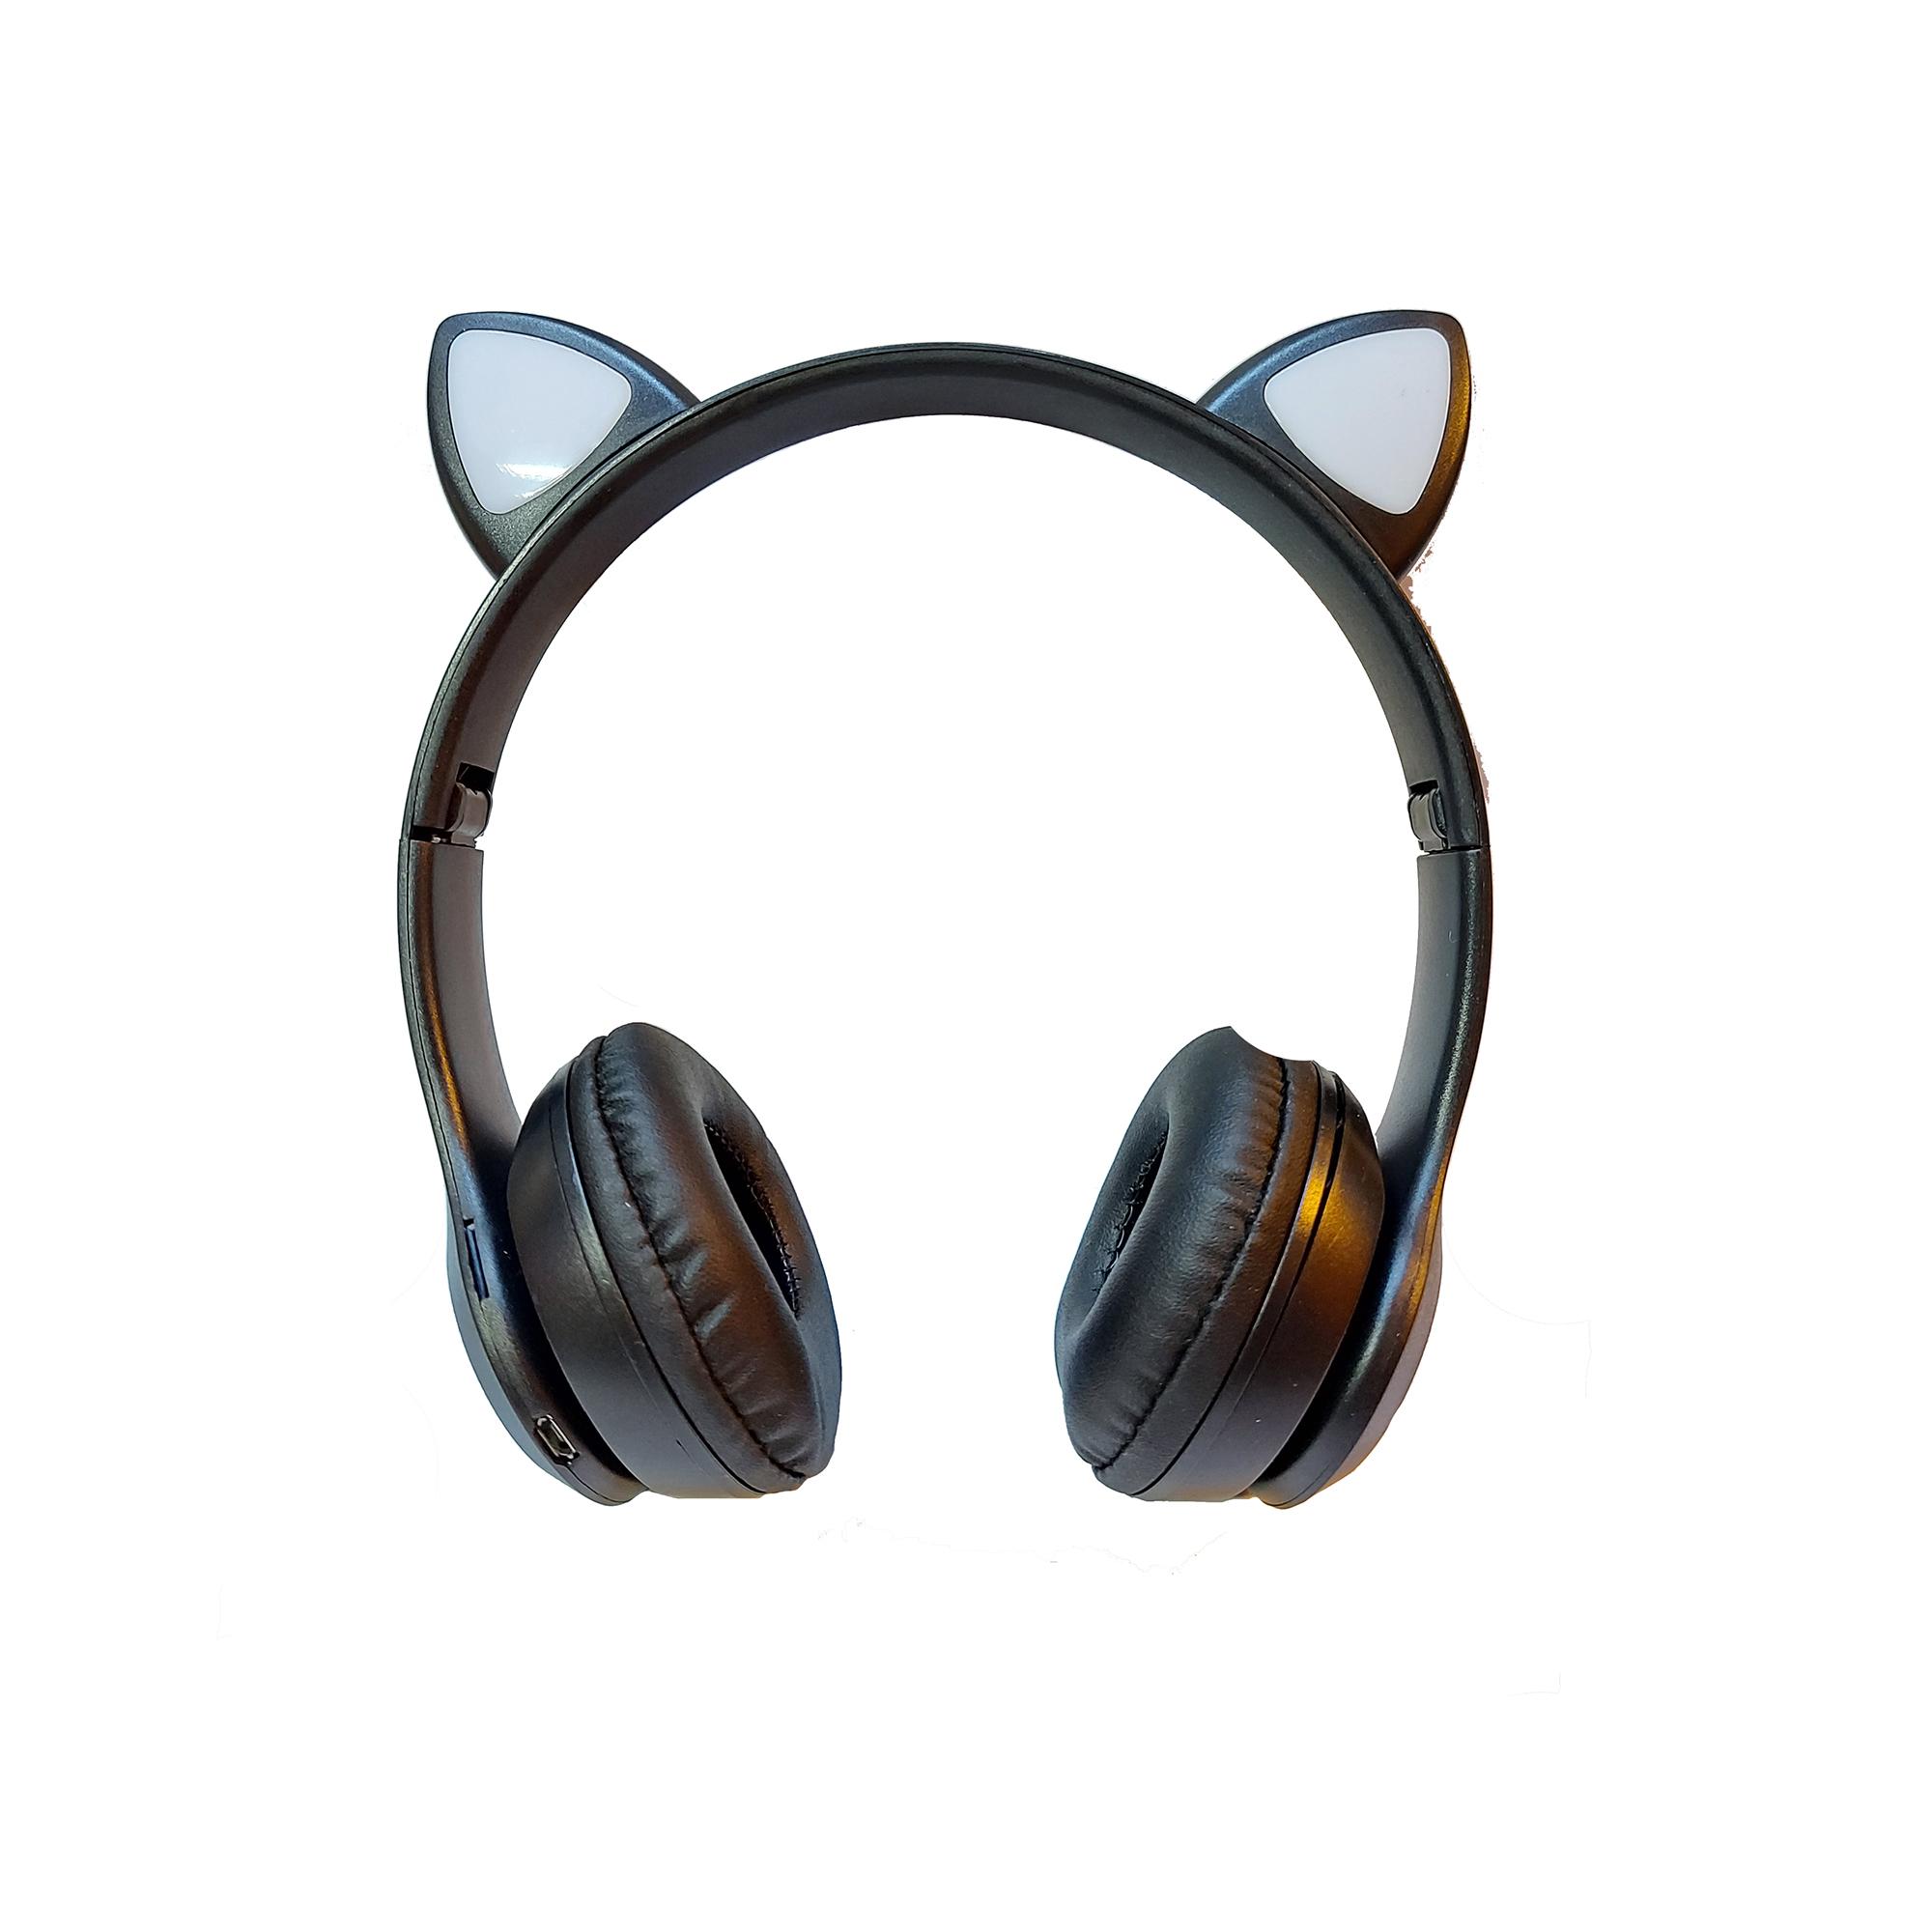 هدست بلوتوثی مدل Cat Eas